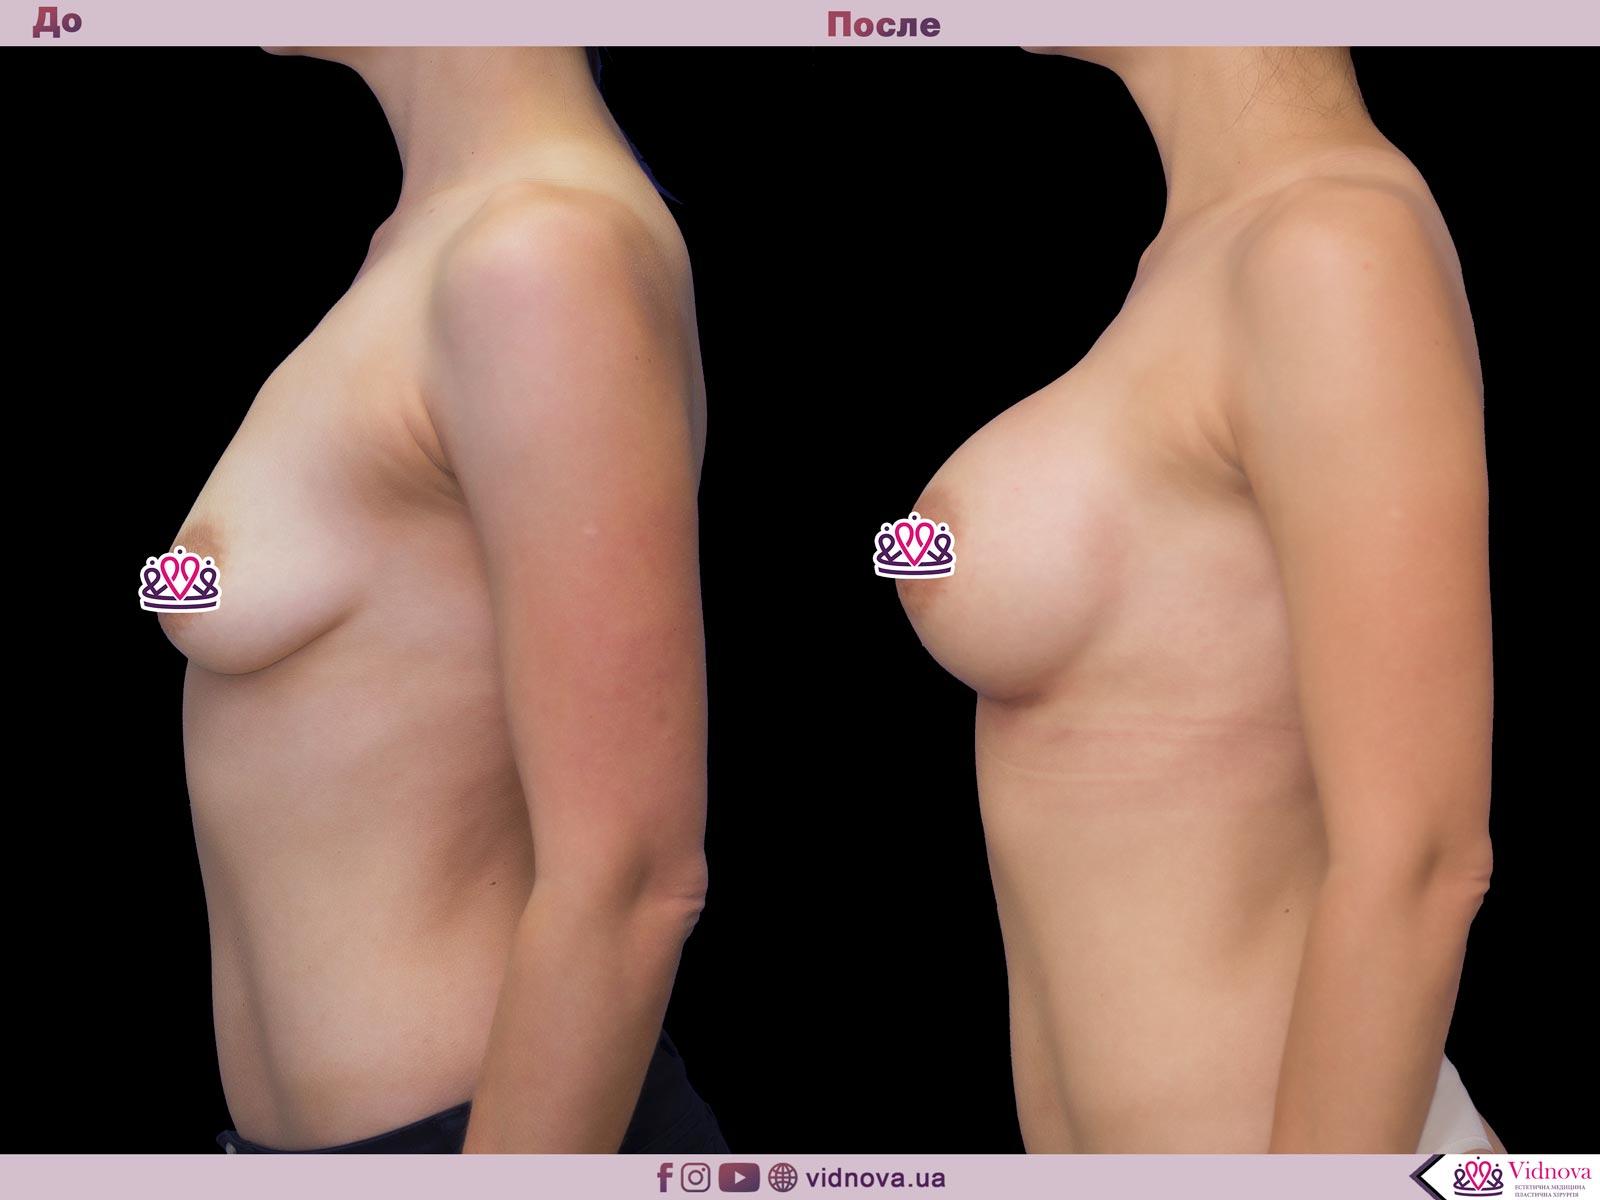 Увеличение груди: Фото ДО и ПОСЛЕ - Пример №53-3 - Клиника Vidnova